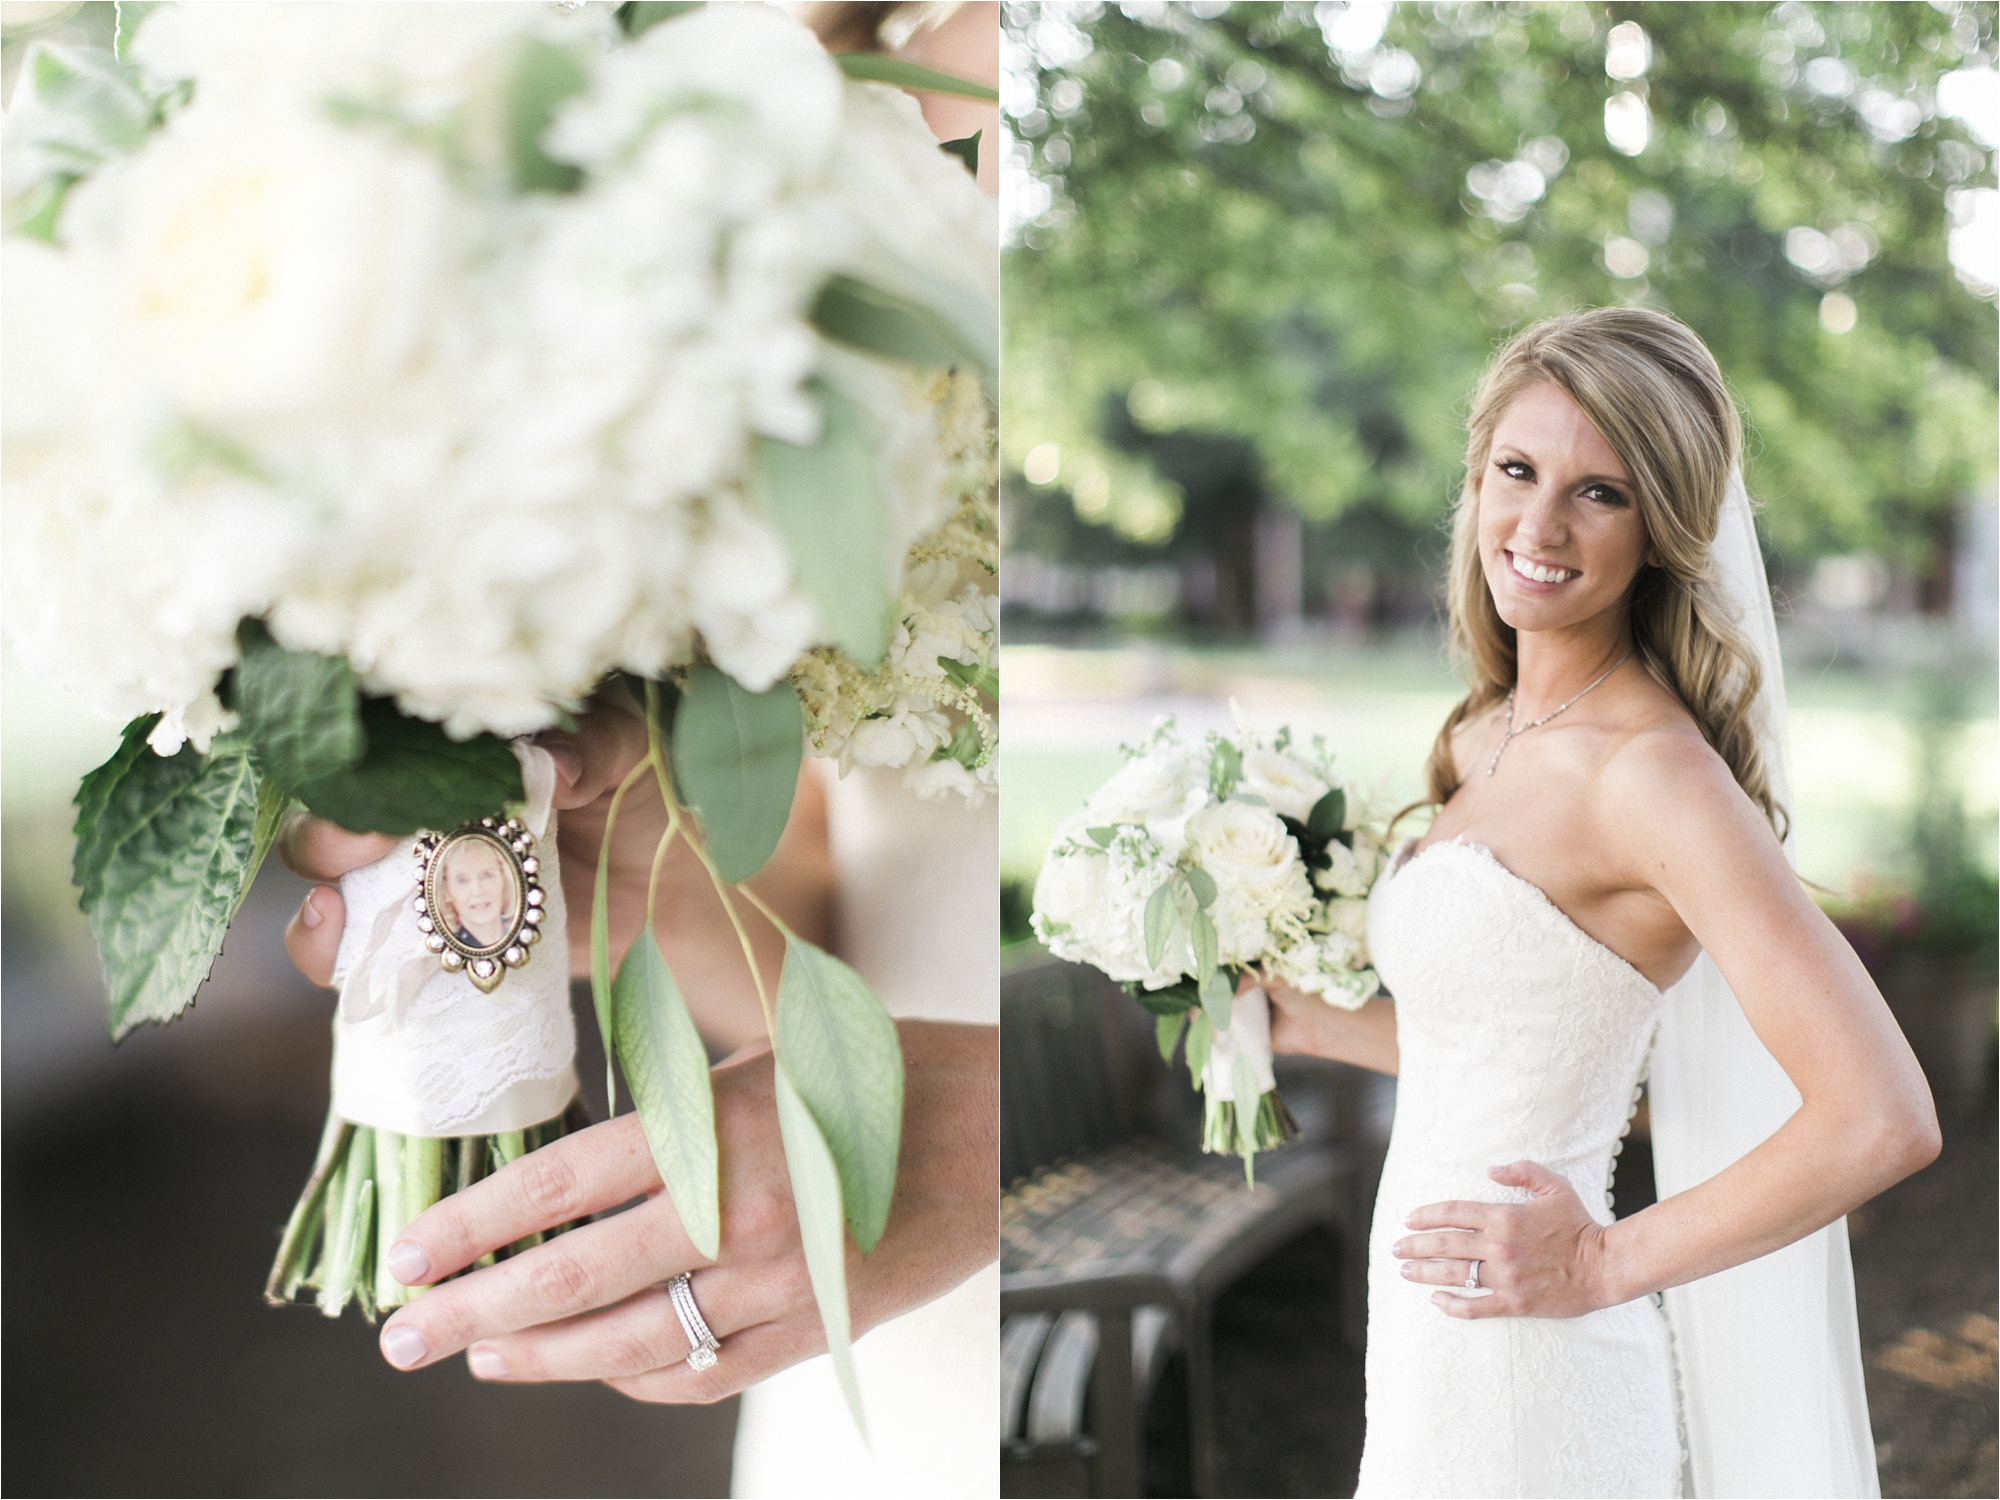 stephanie-yonce-photography-richmond-virginia-country-club-wedding_0033.jpg